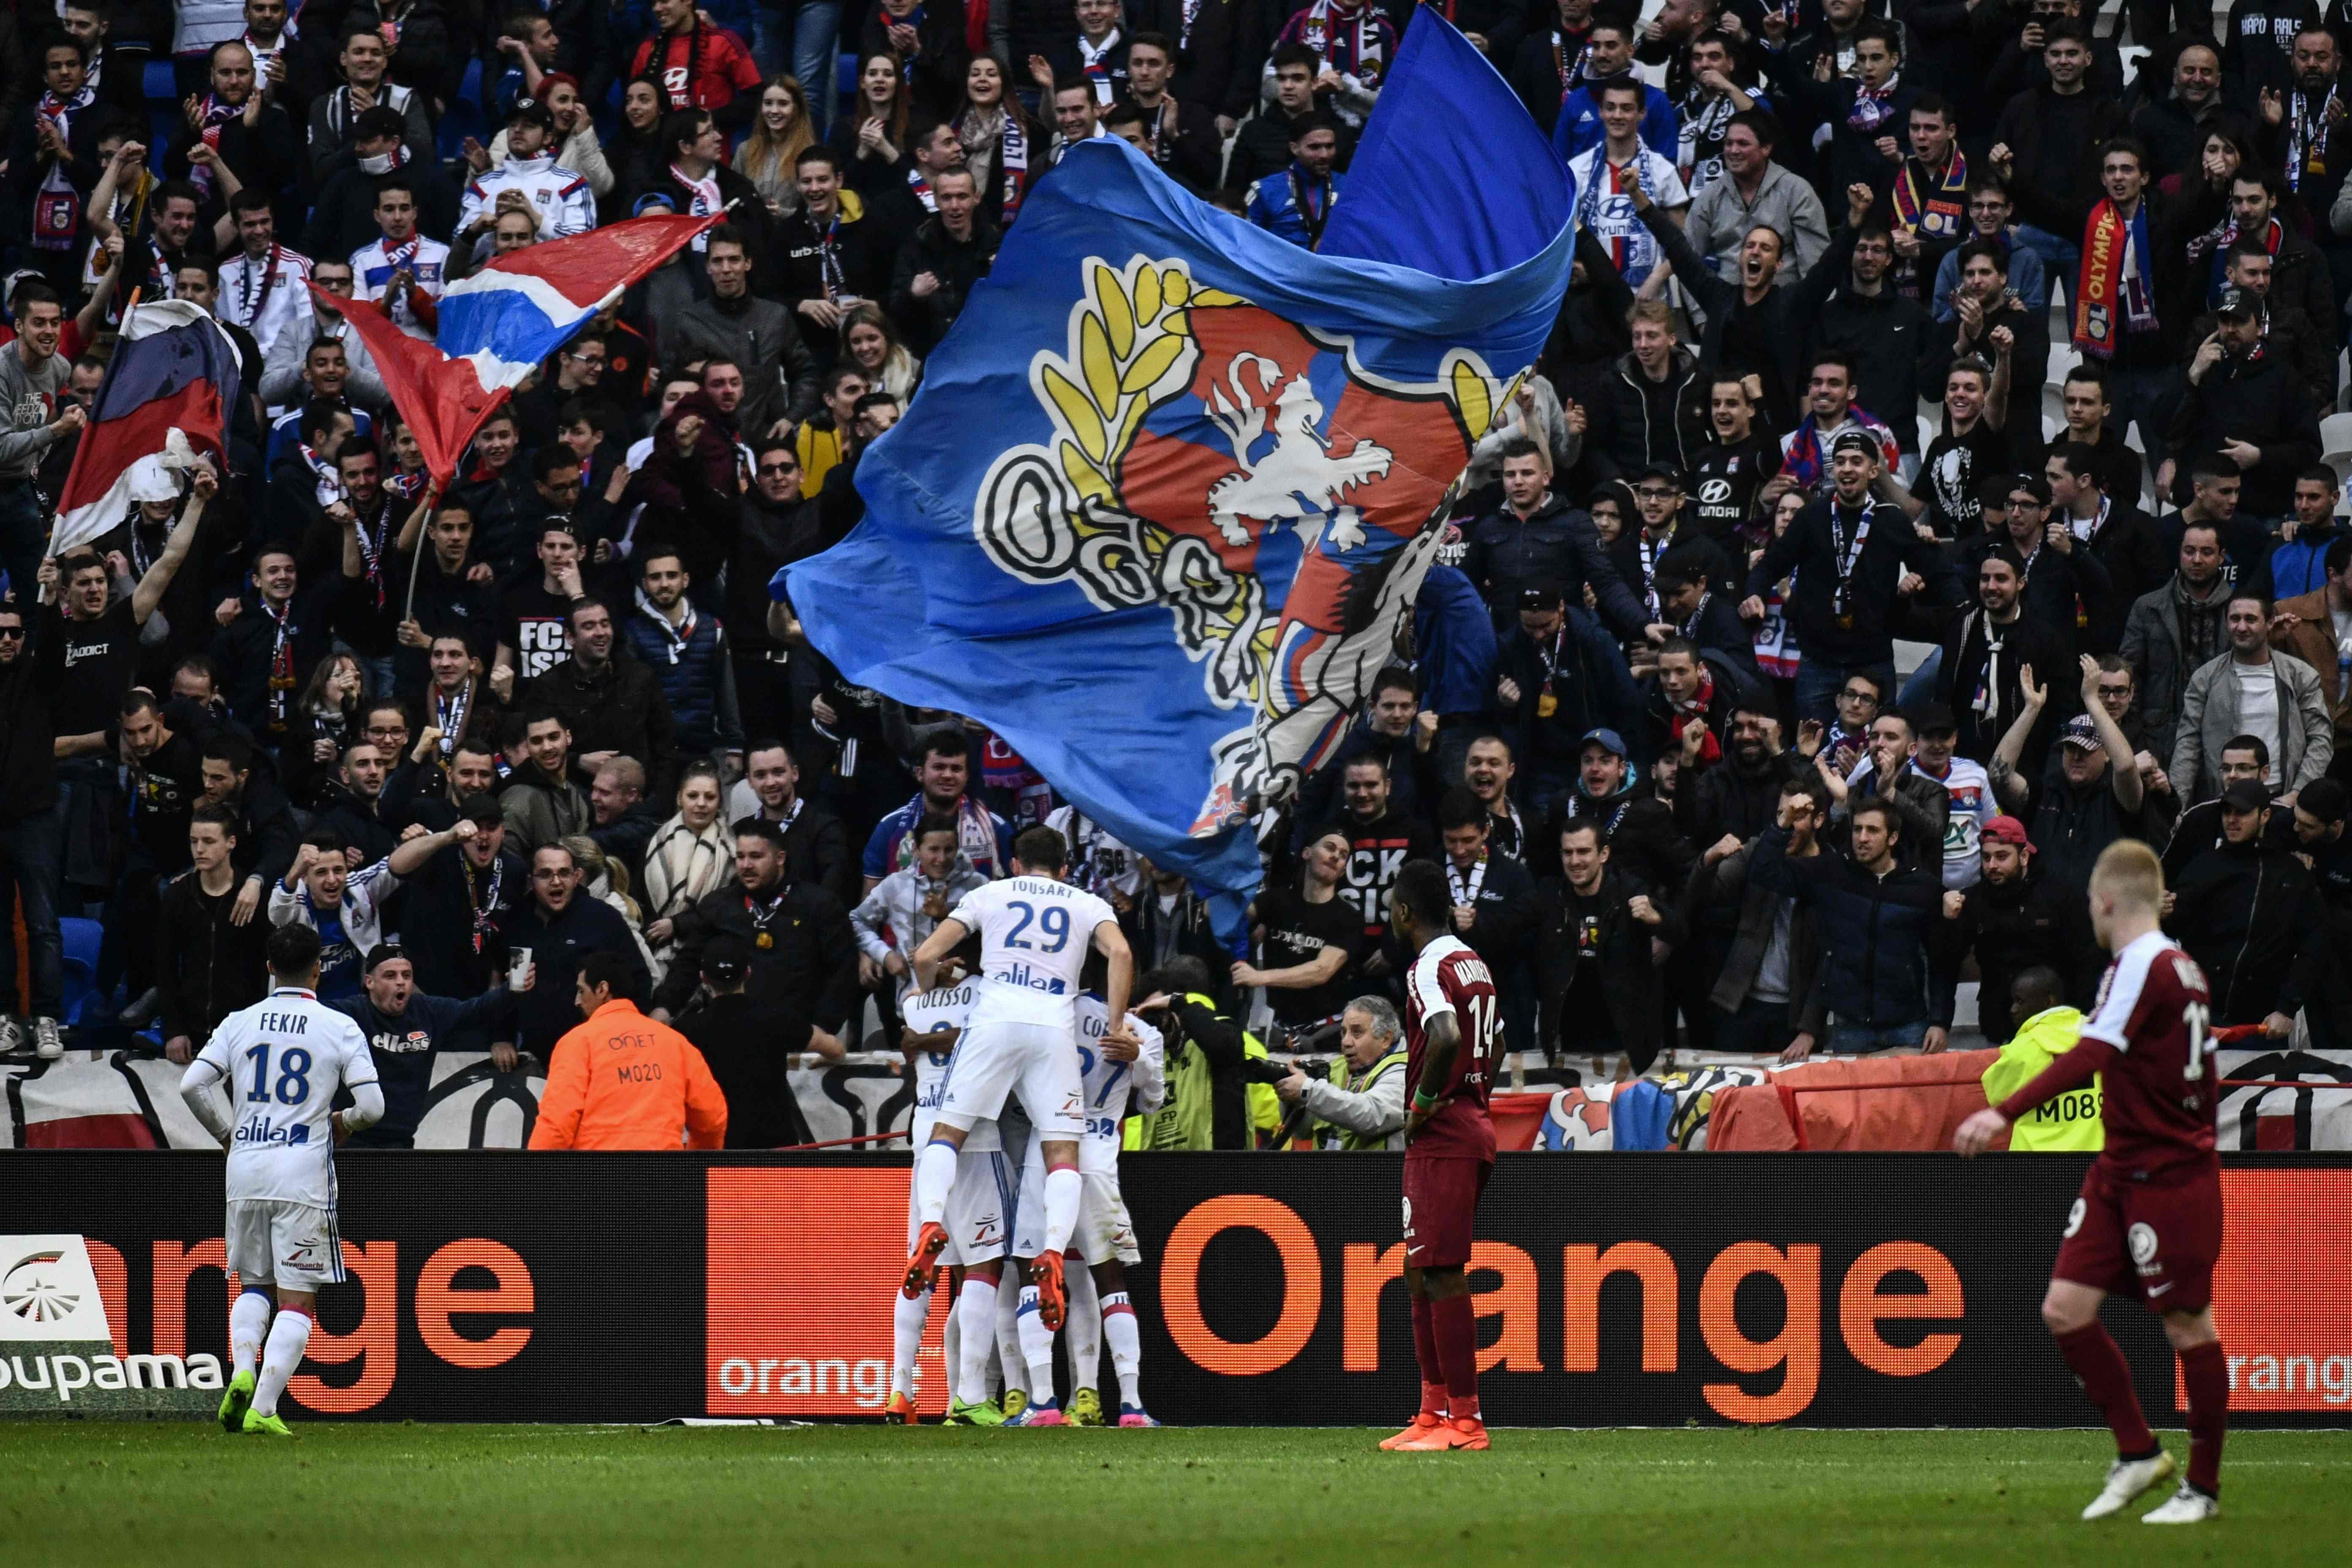 Football - Ligue 1 - OM - PSG, Depay, Mavuba : les chiffres marquants du week-end en L1